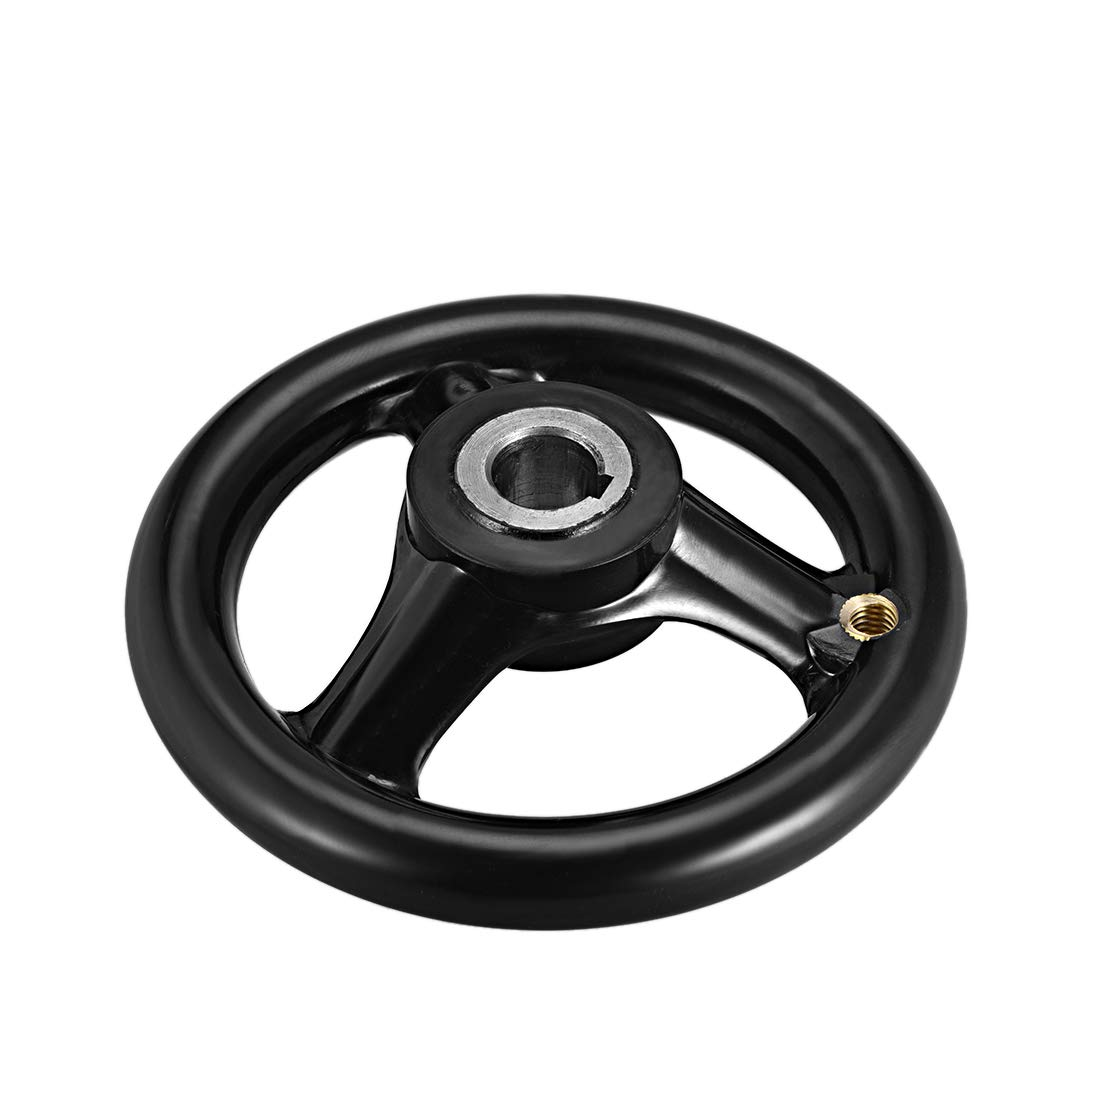 uxcell Hand Wheel 102mm Diameter 12mm Hole Diameter for Milling Machine